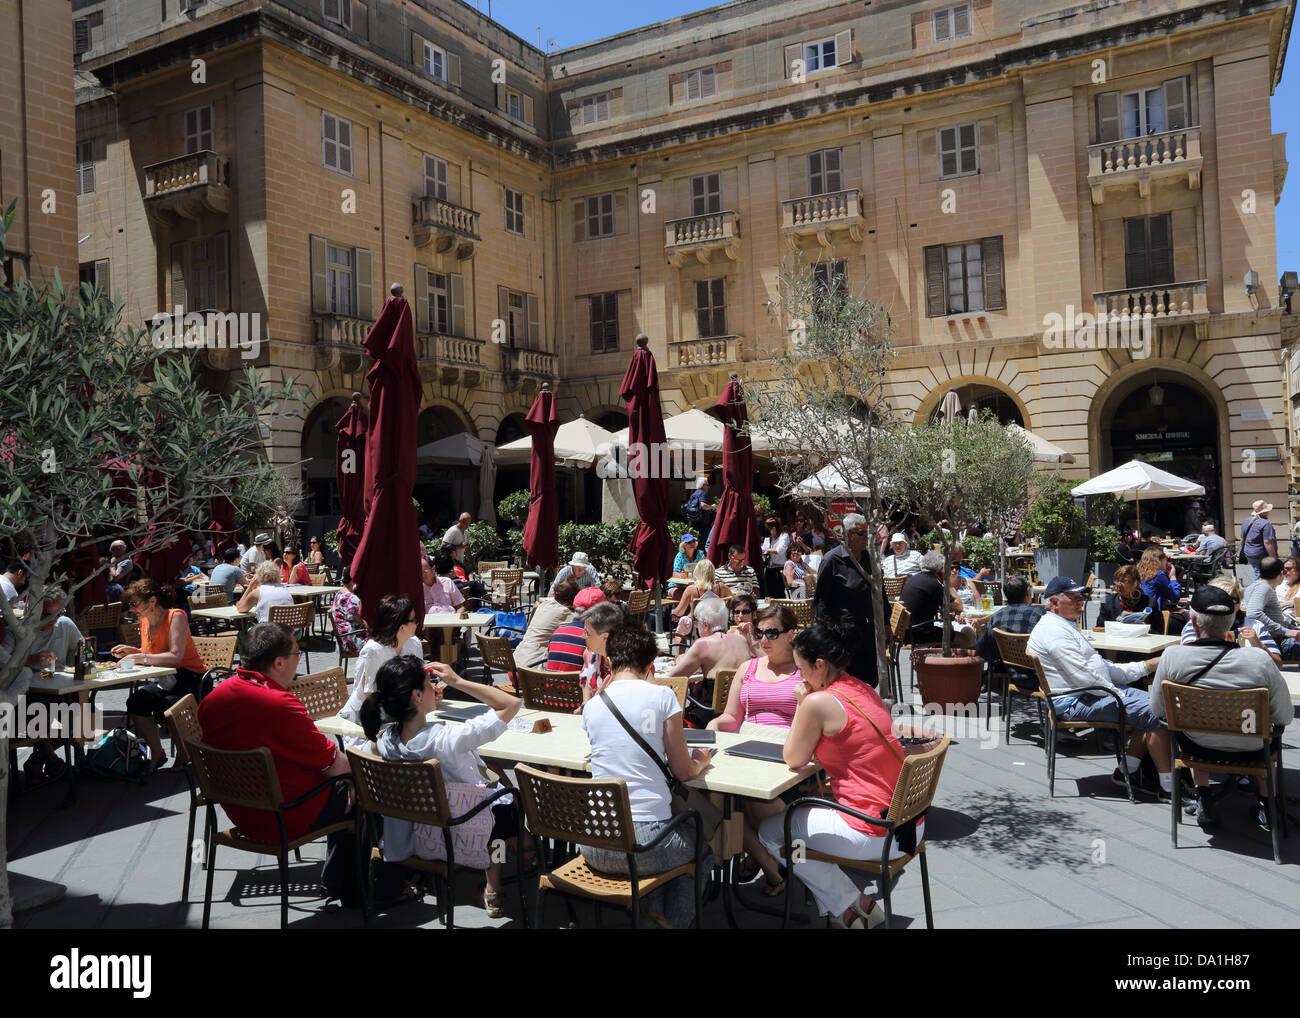 CAFE,ST.JOHN'S SQUARE,VALLETTA,MALTA - Stock Image